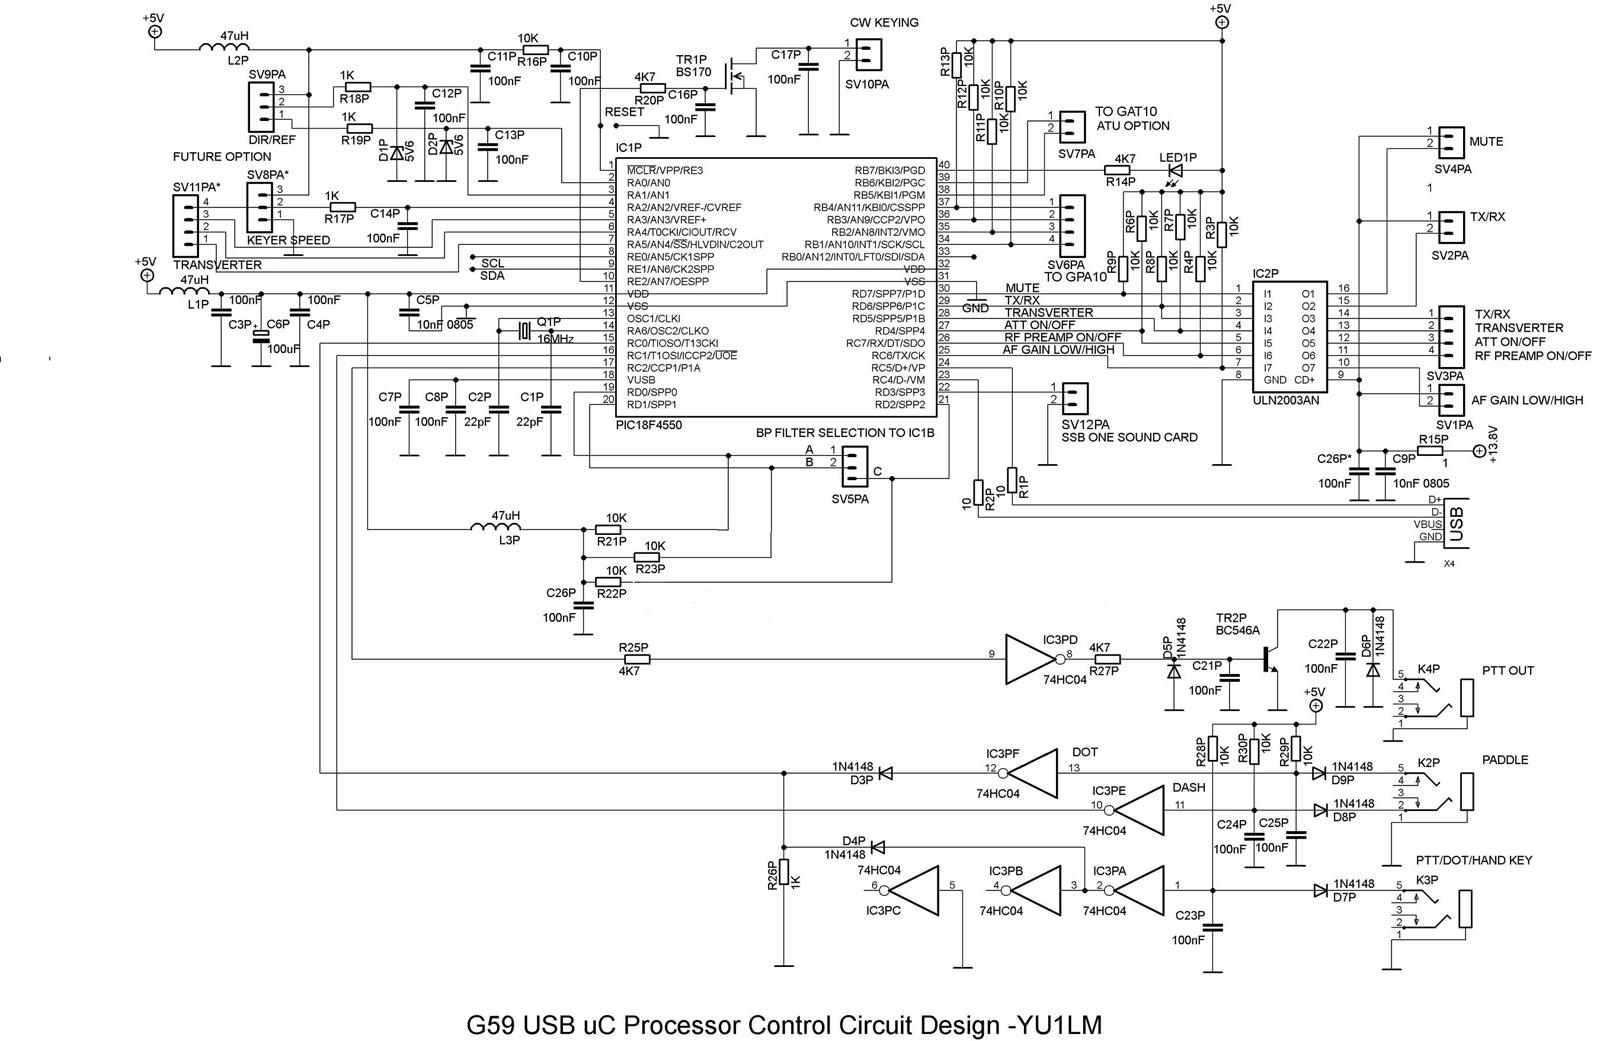 Asco 940 Wiring Diagram